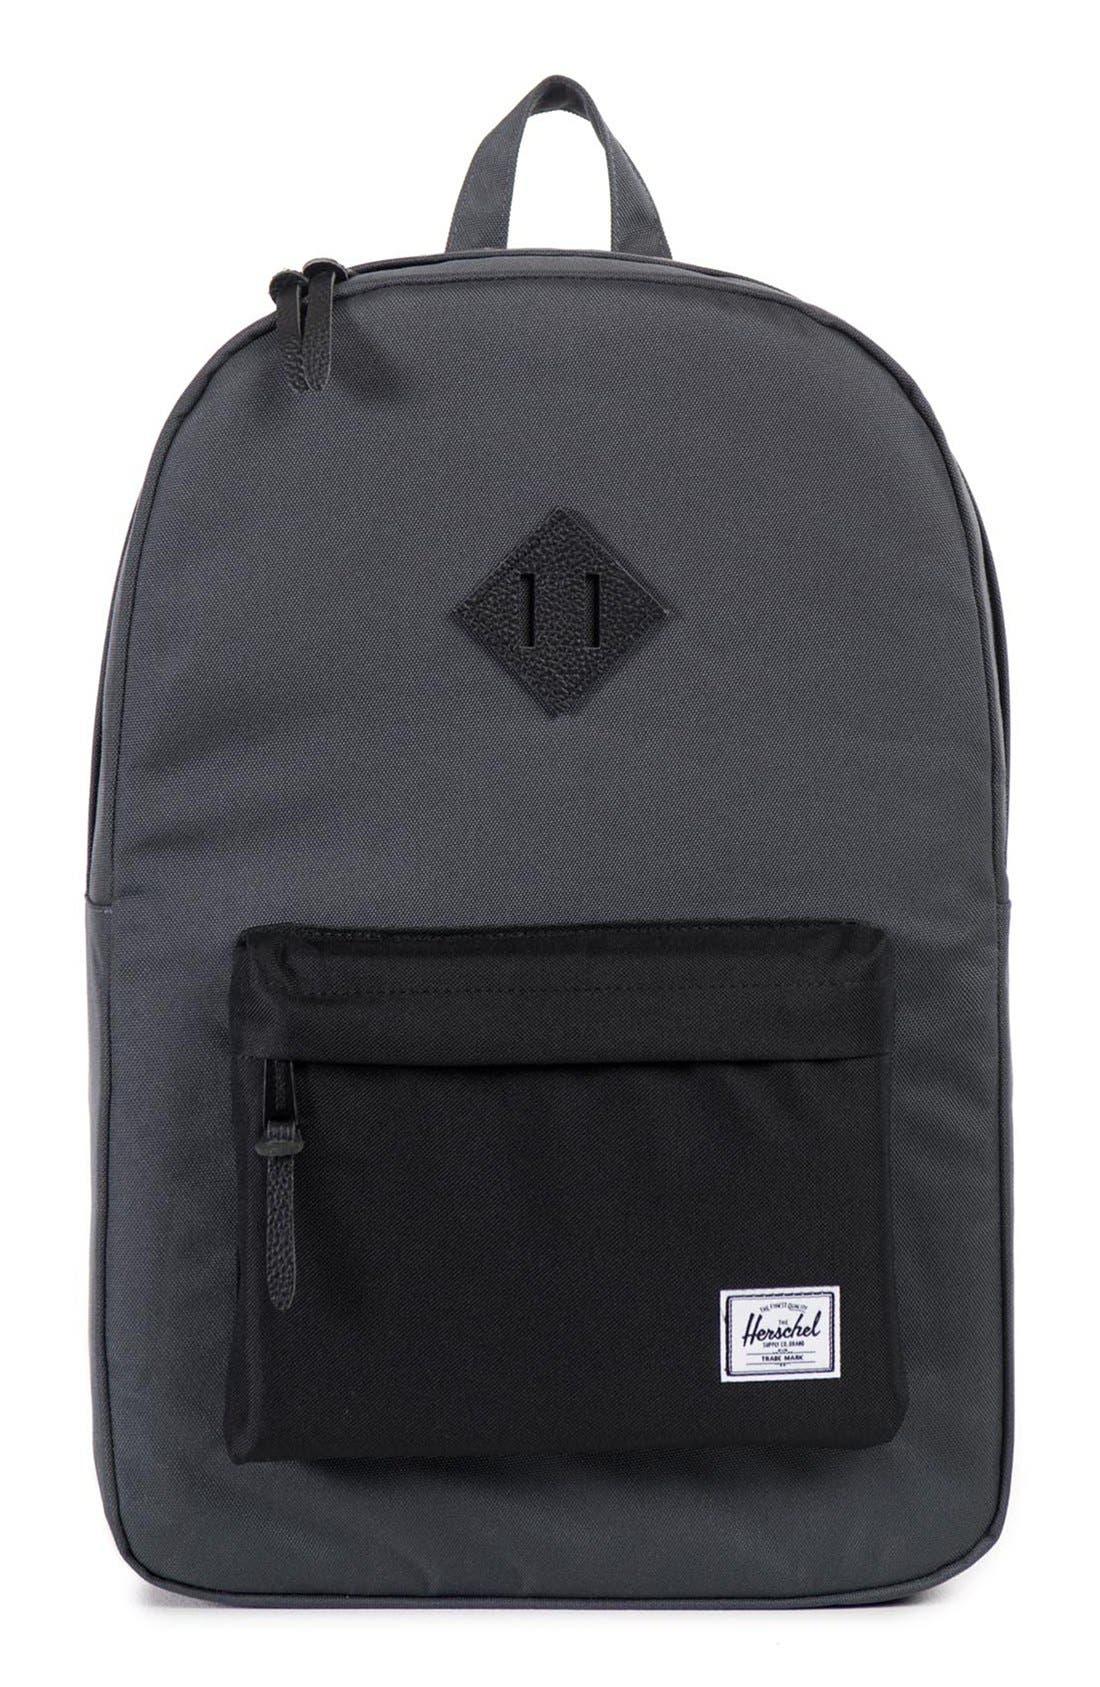 Main Image - Herschel Supply Co. 'Heritage' Backpack